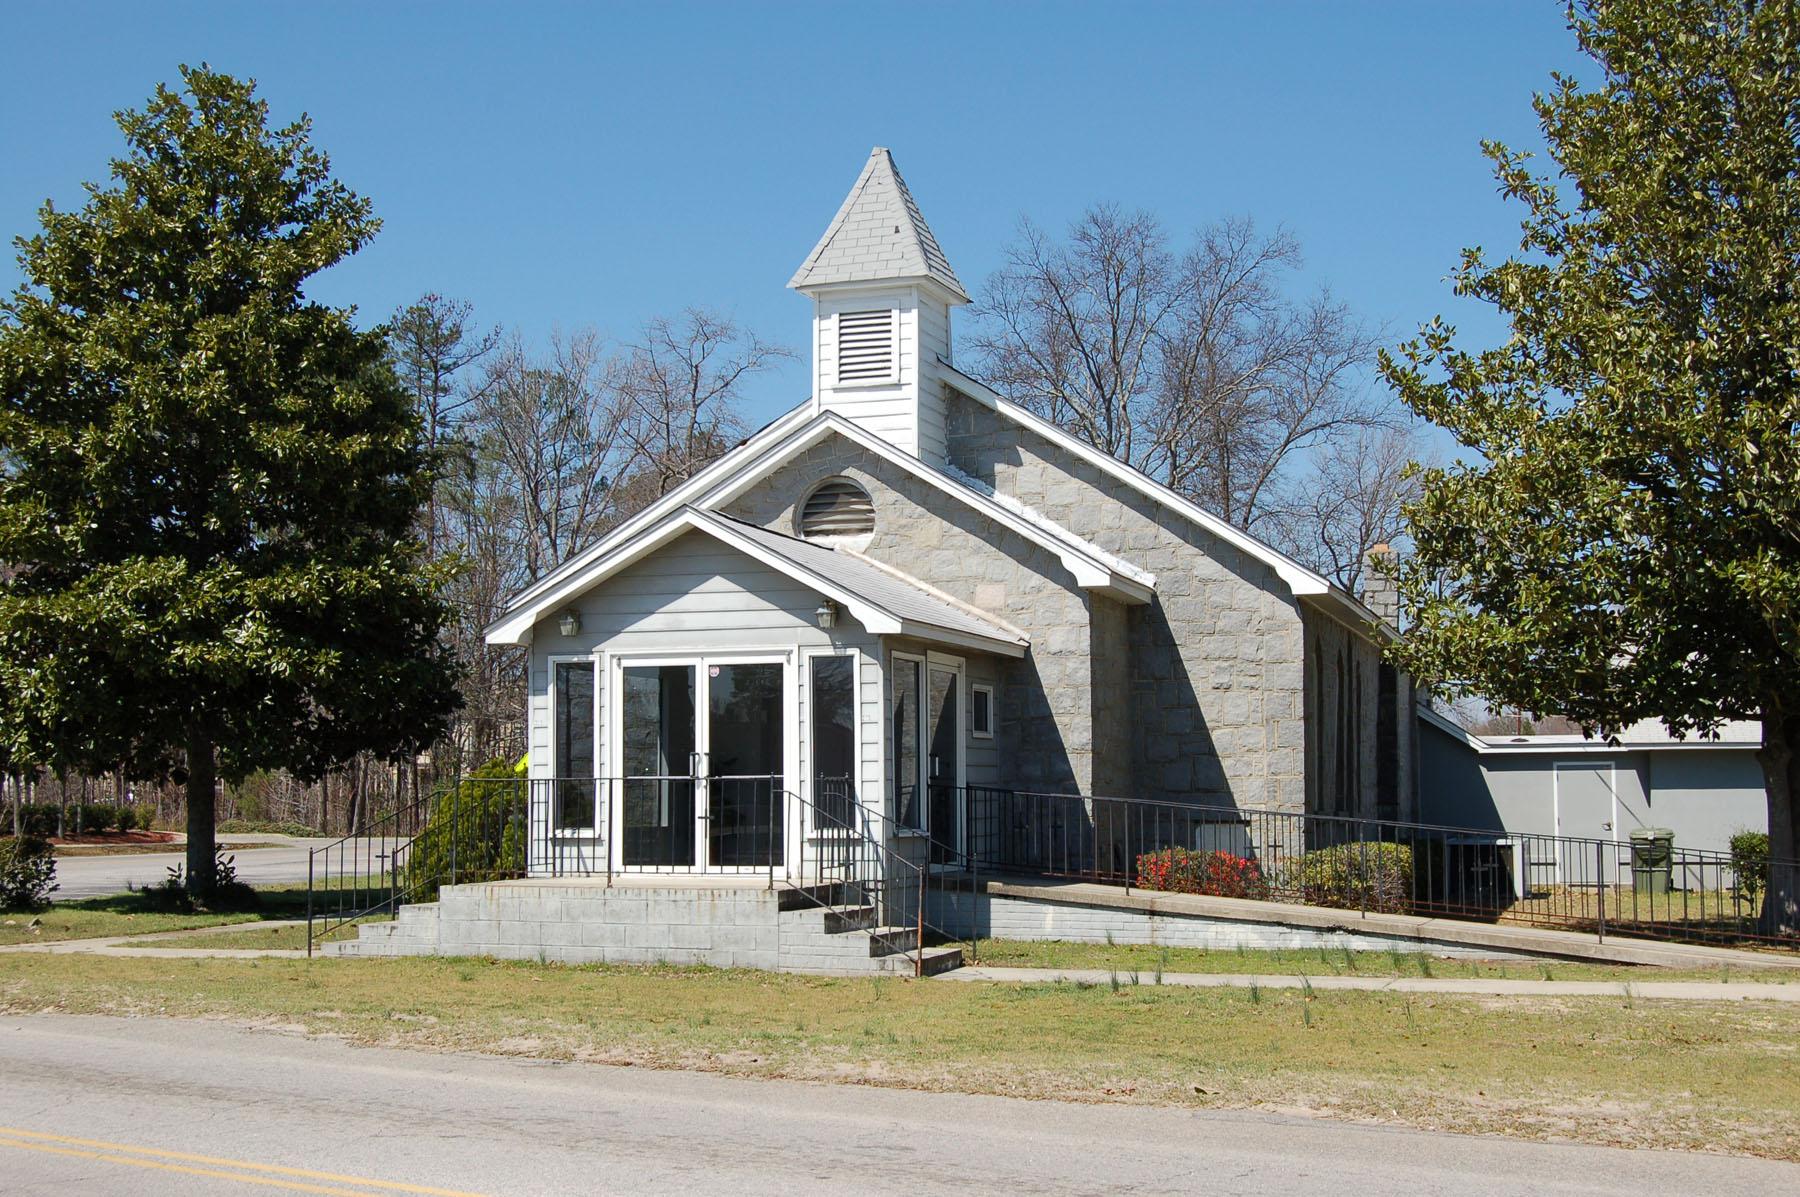 Bethel Baptist Church built in 1884. It bean as a brush arbor church and is designated Richland County Landmark.  Photo by Jim McLean.